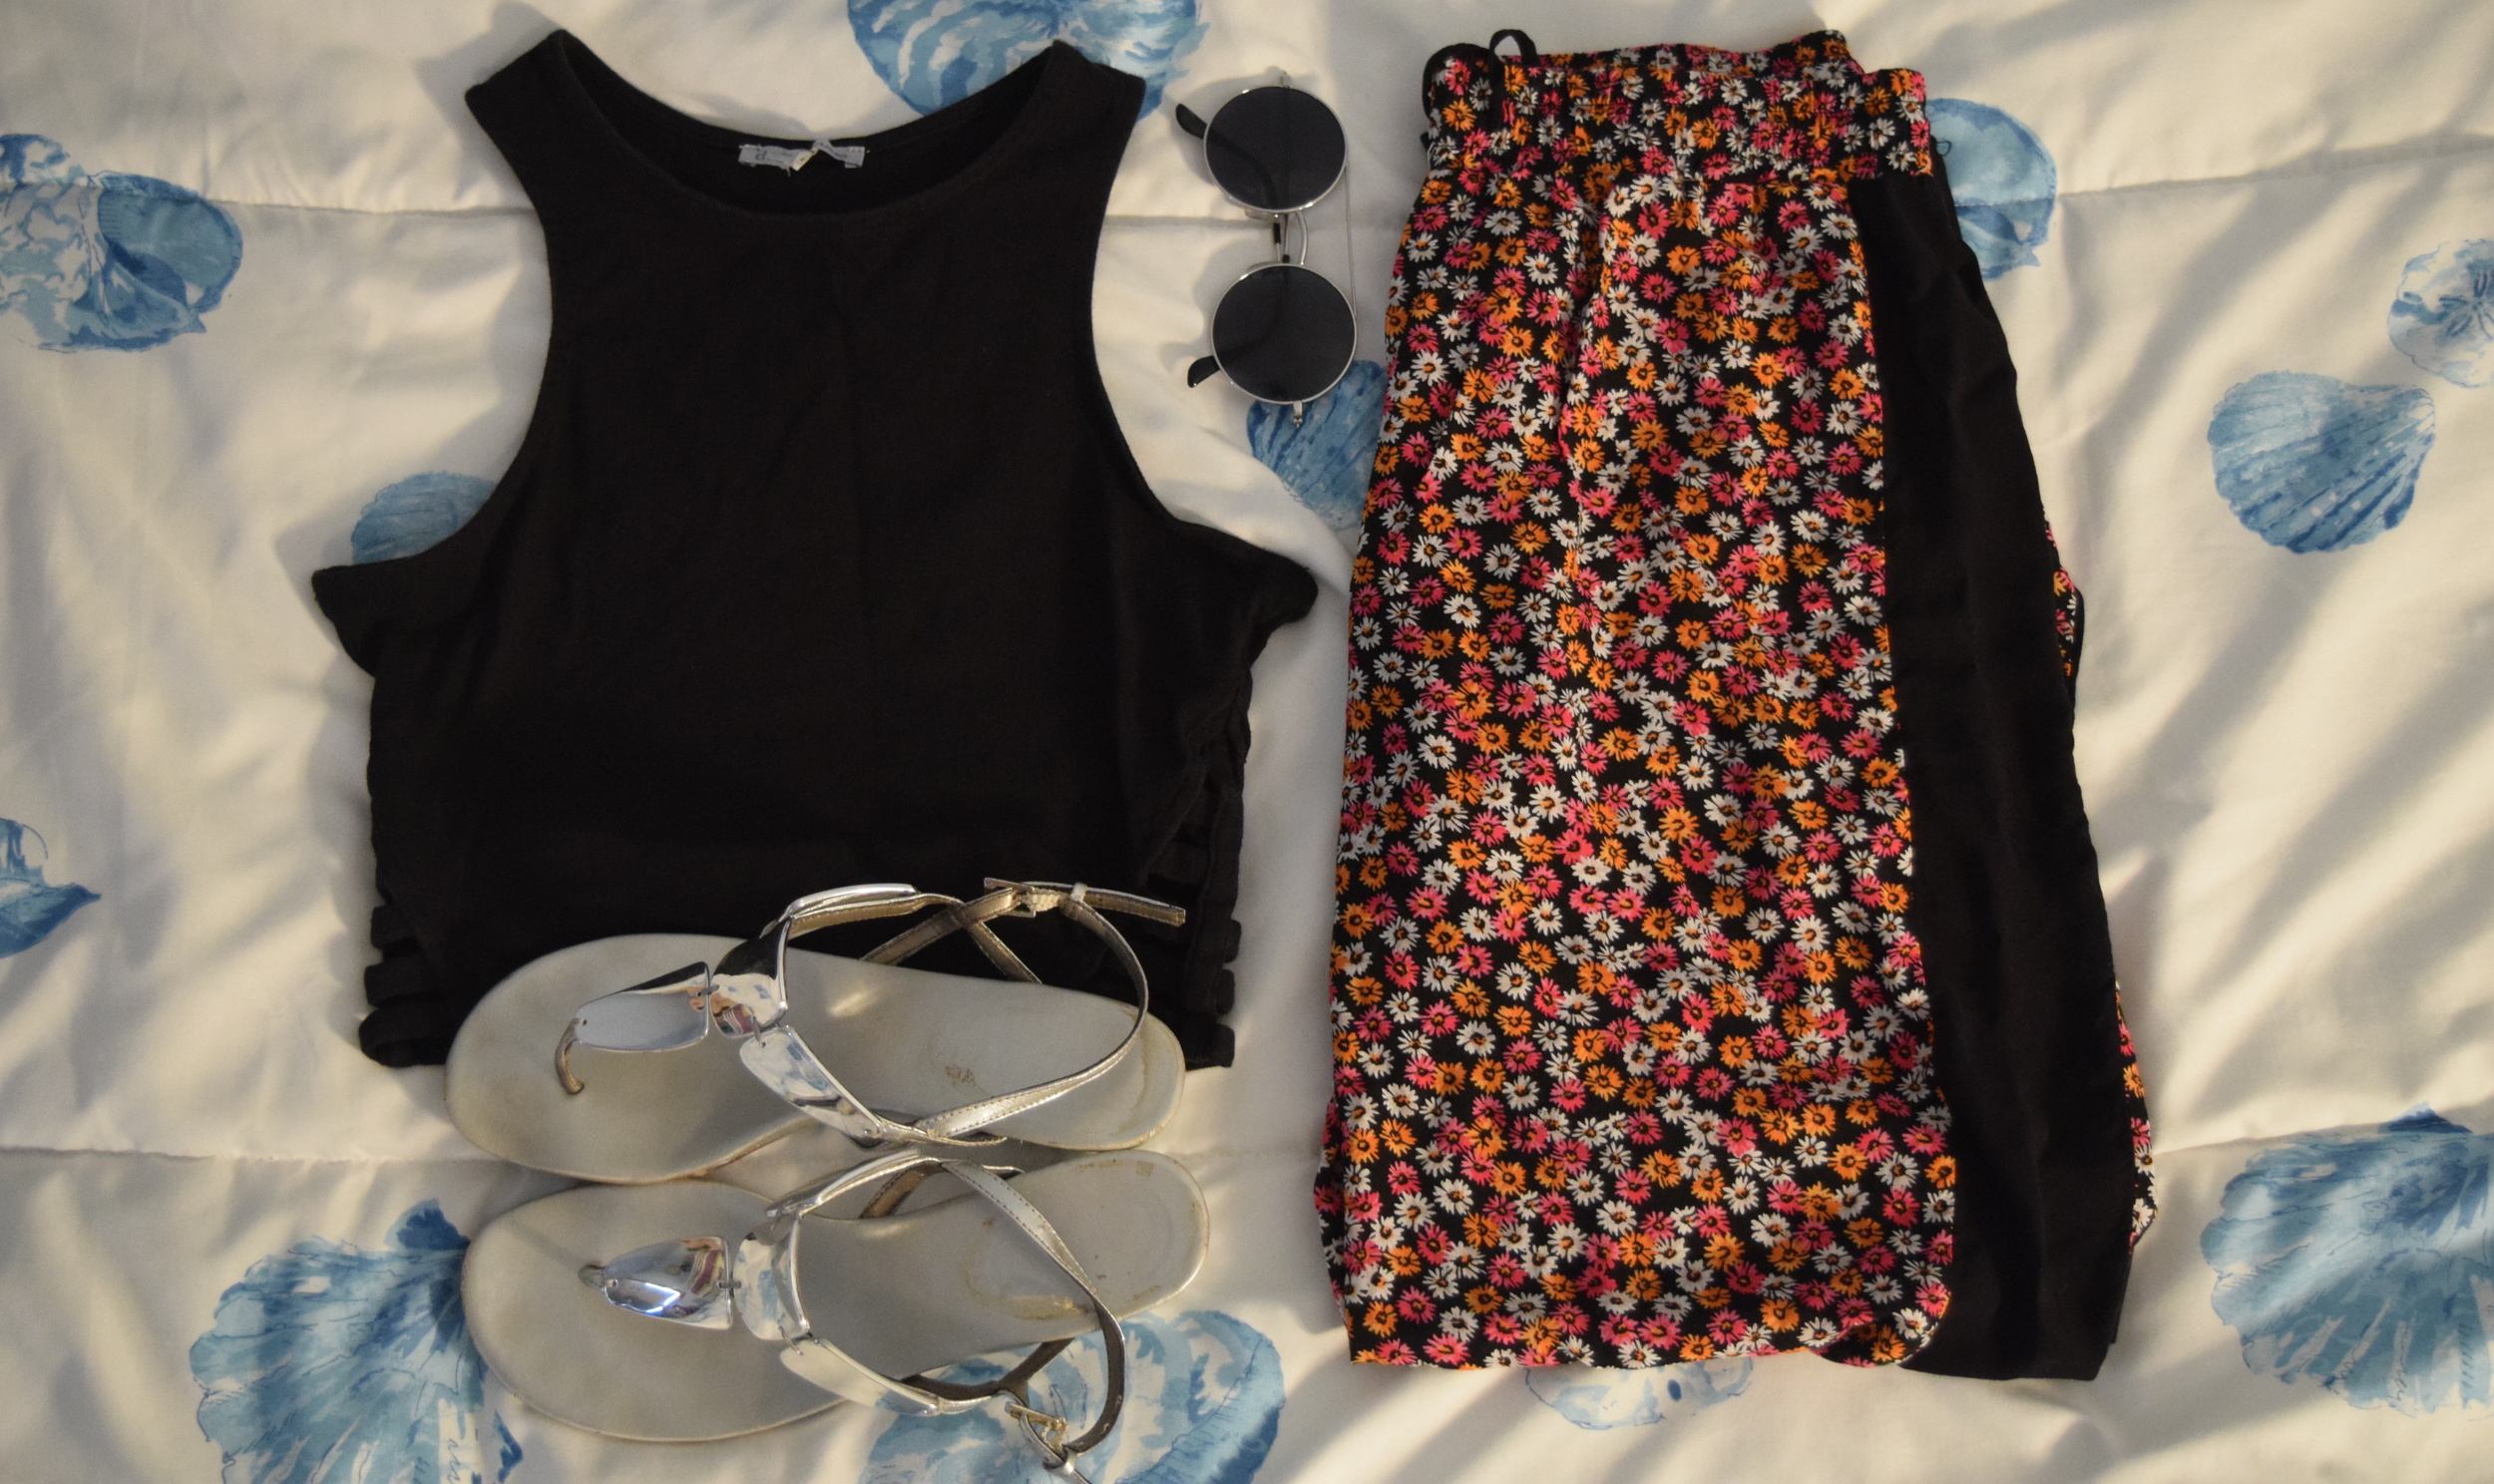 Top  (similar).  Pants .  Sunglasses  (similar). Sandals (no longer being sold at  Payless ).